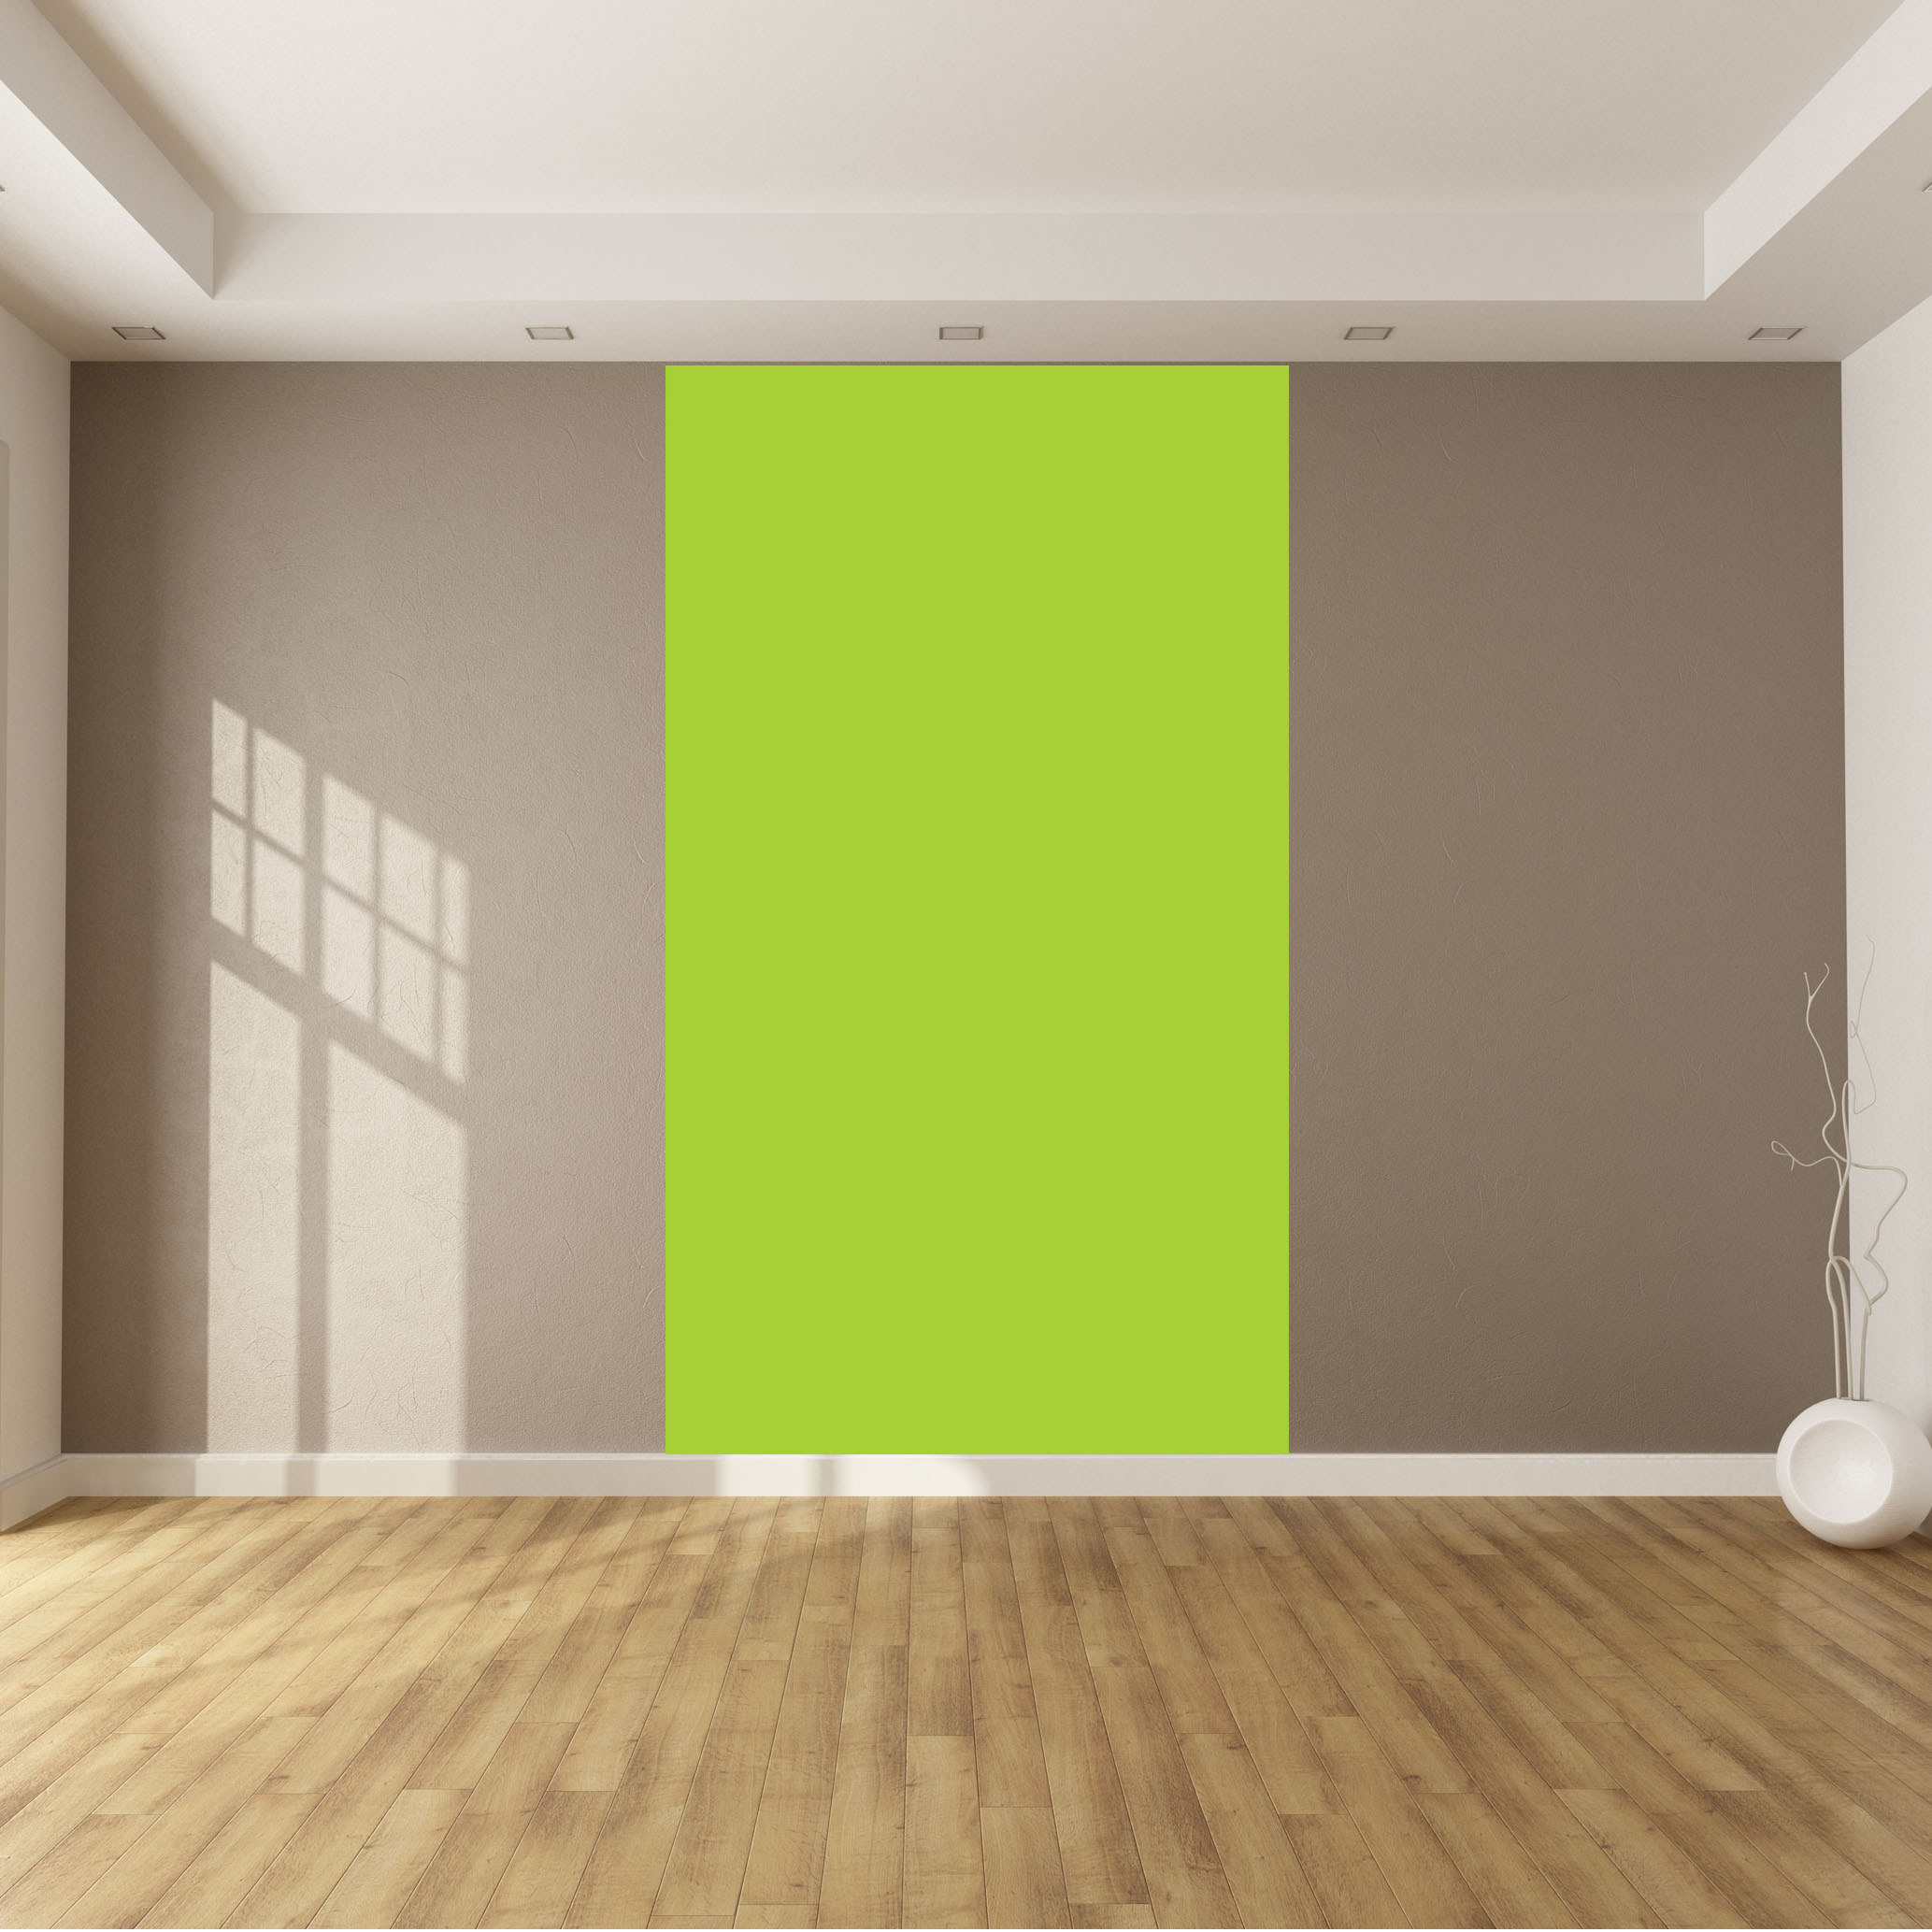 Adesivi follia : Adesivo Murale metro colore Verde mela